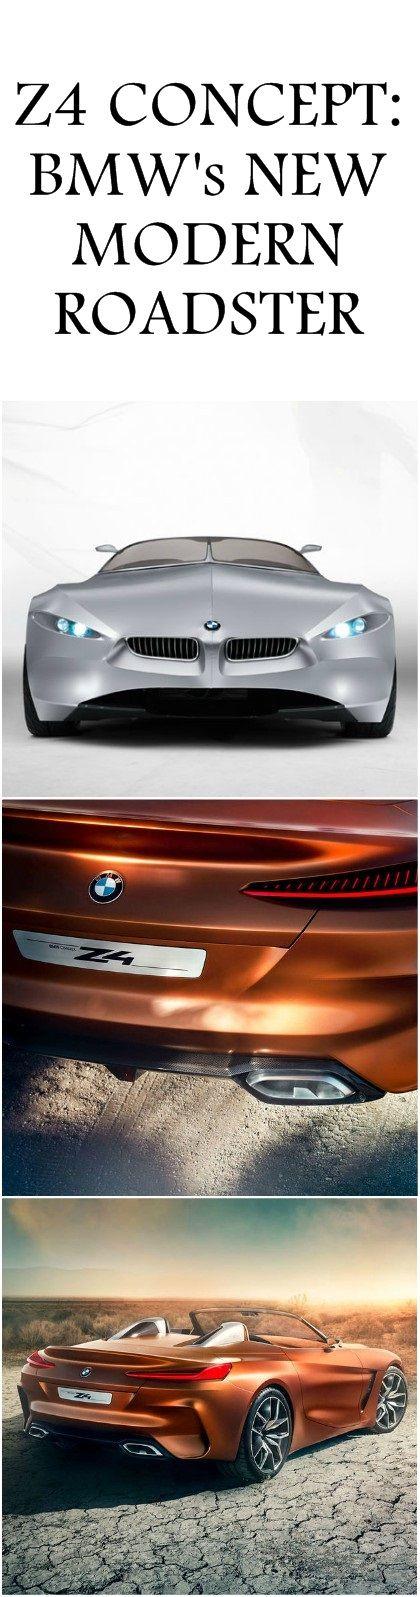 #Z4 #CONCEPT: #BMW's NEW MODERN ROADSTER